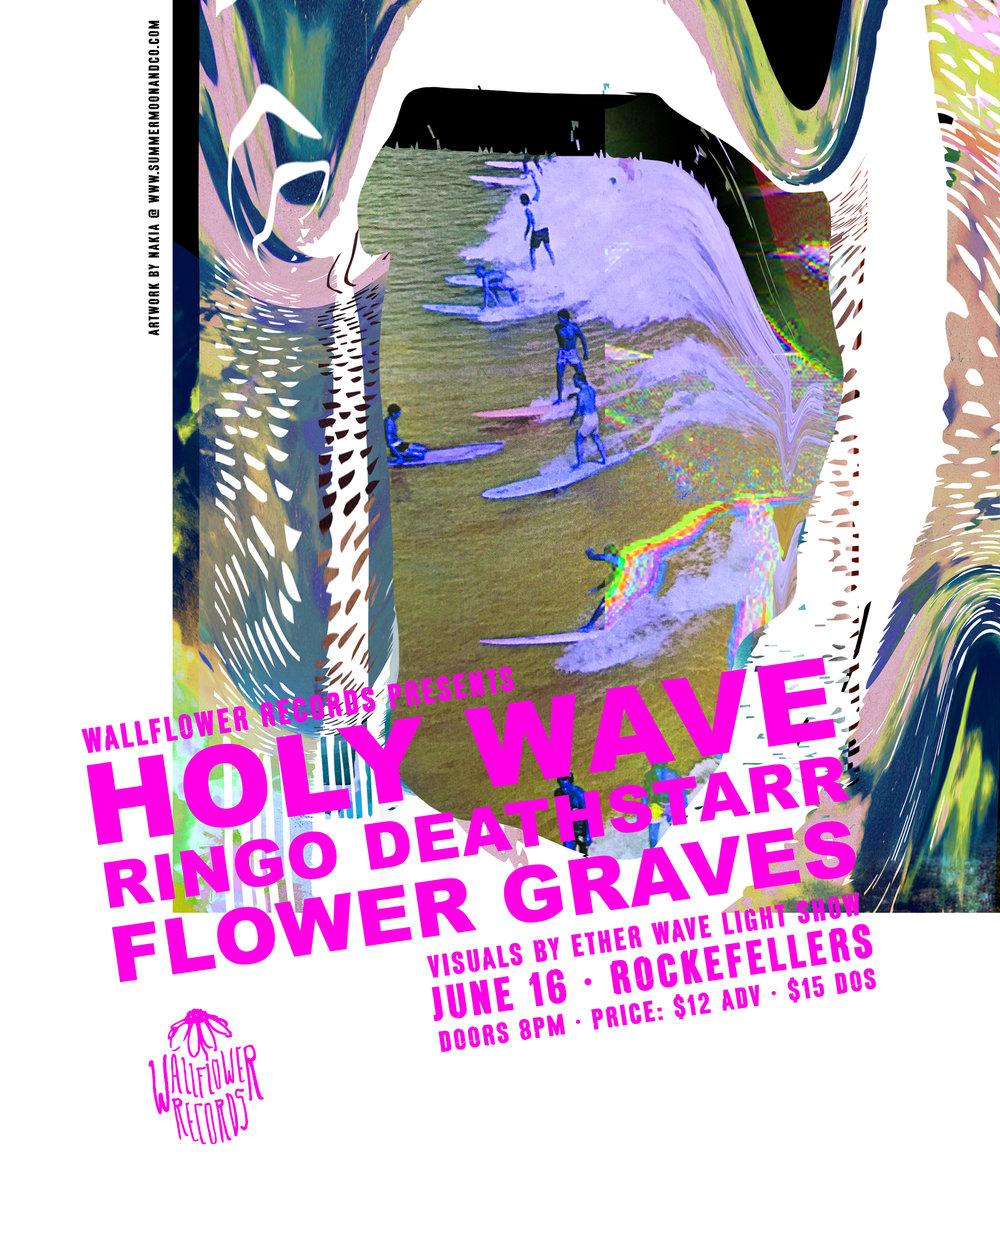 Holy Wave Ringo Deathastarr.jpg